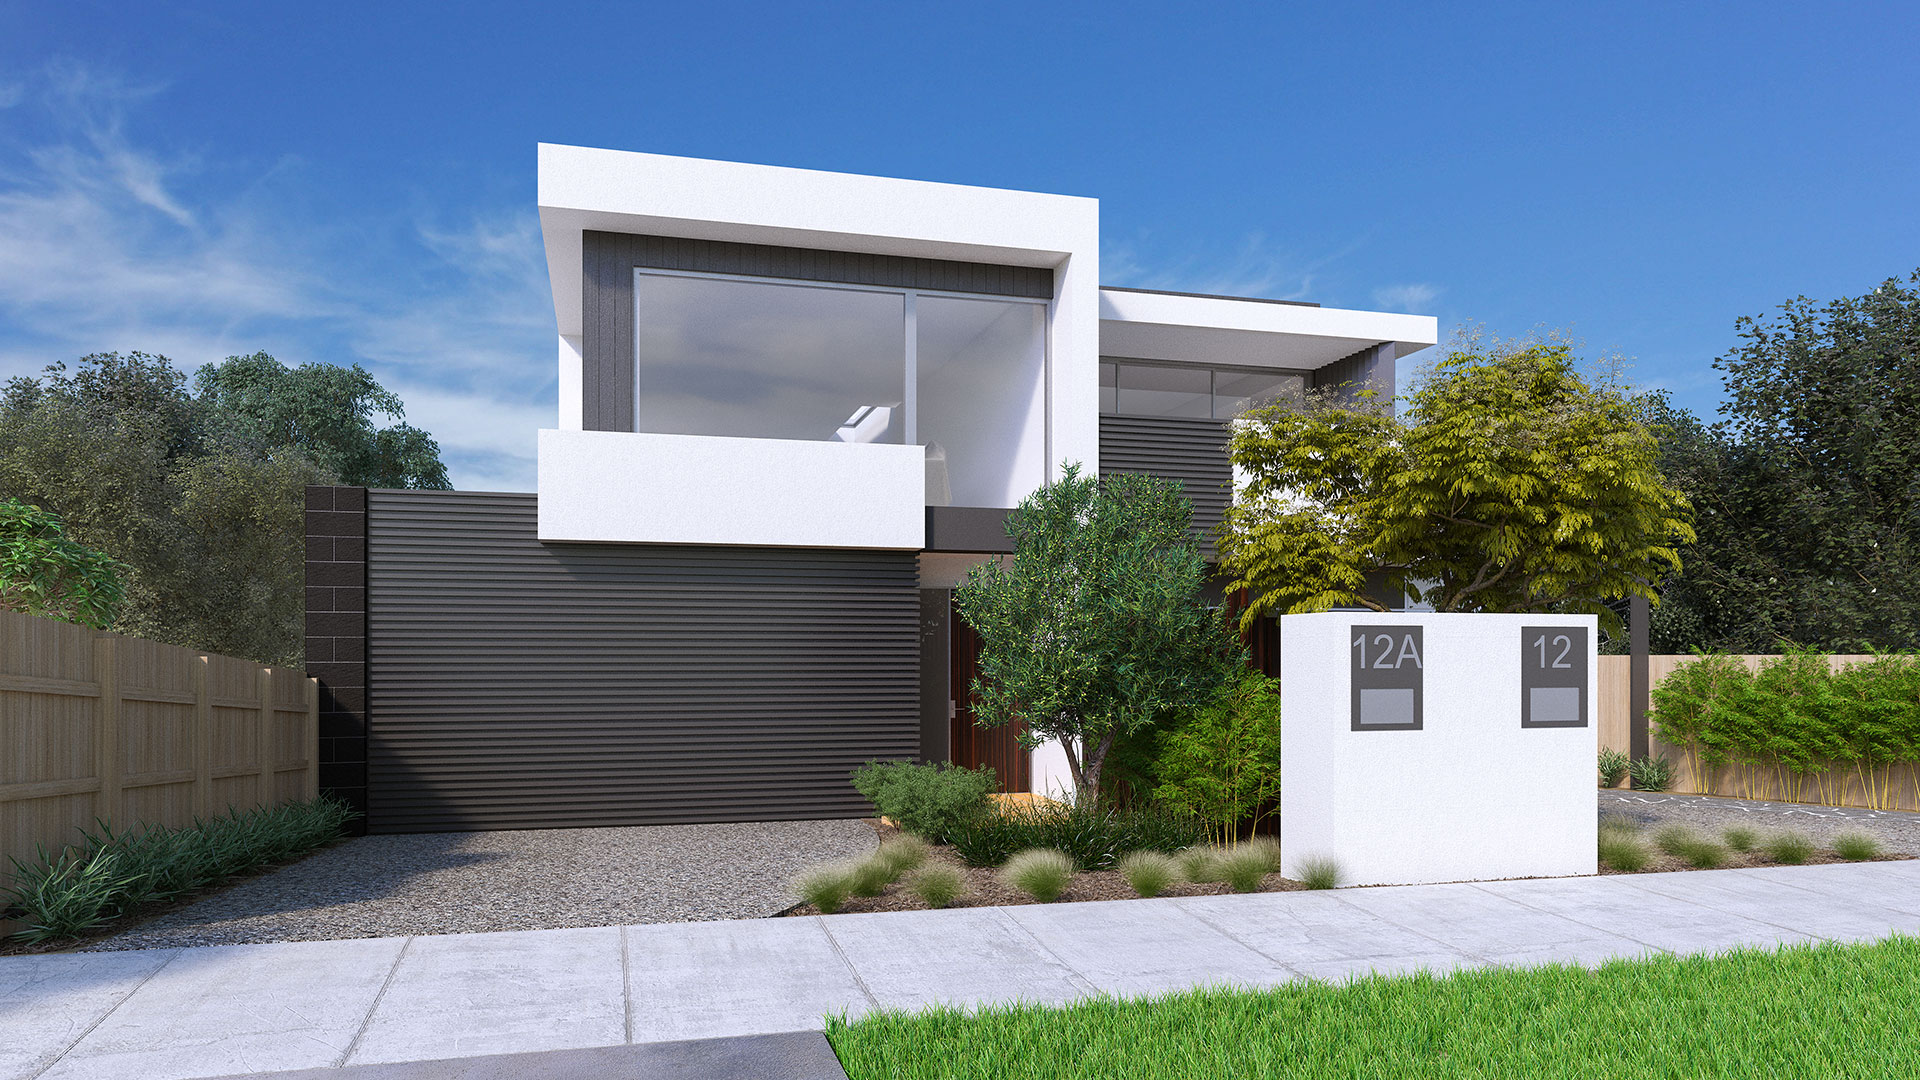 ArcViz-Studio-Lowe-Design-build-parkdale-3D-render-Arist-Impression.jpg